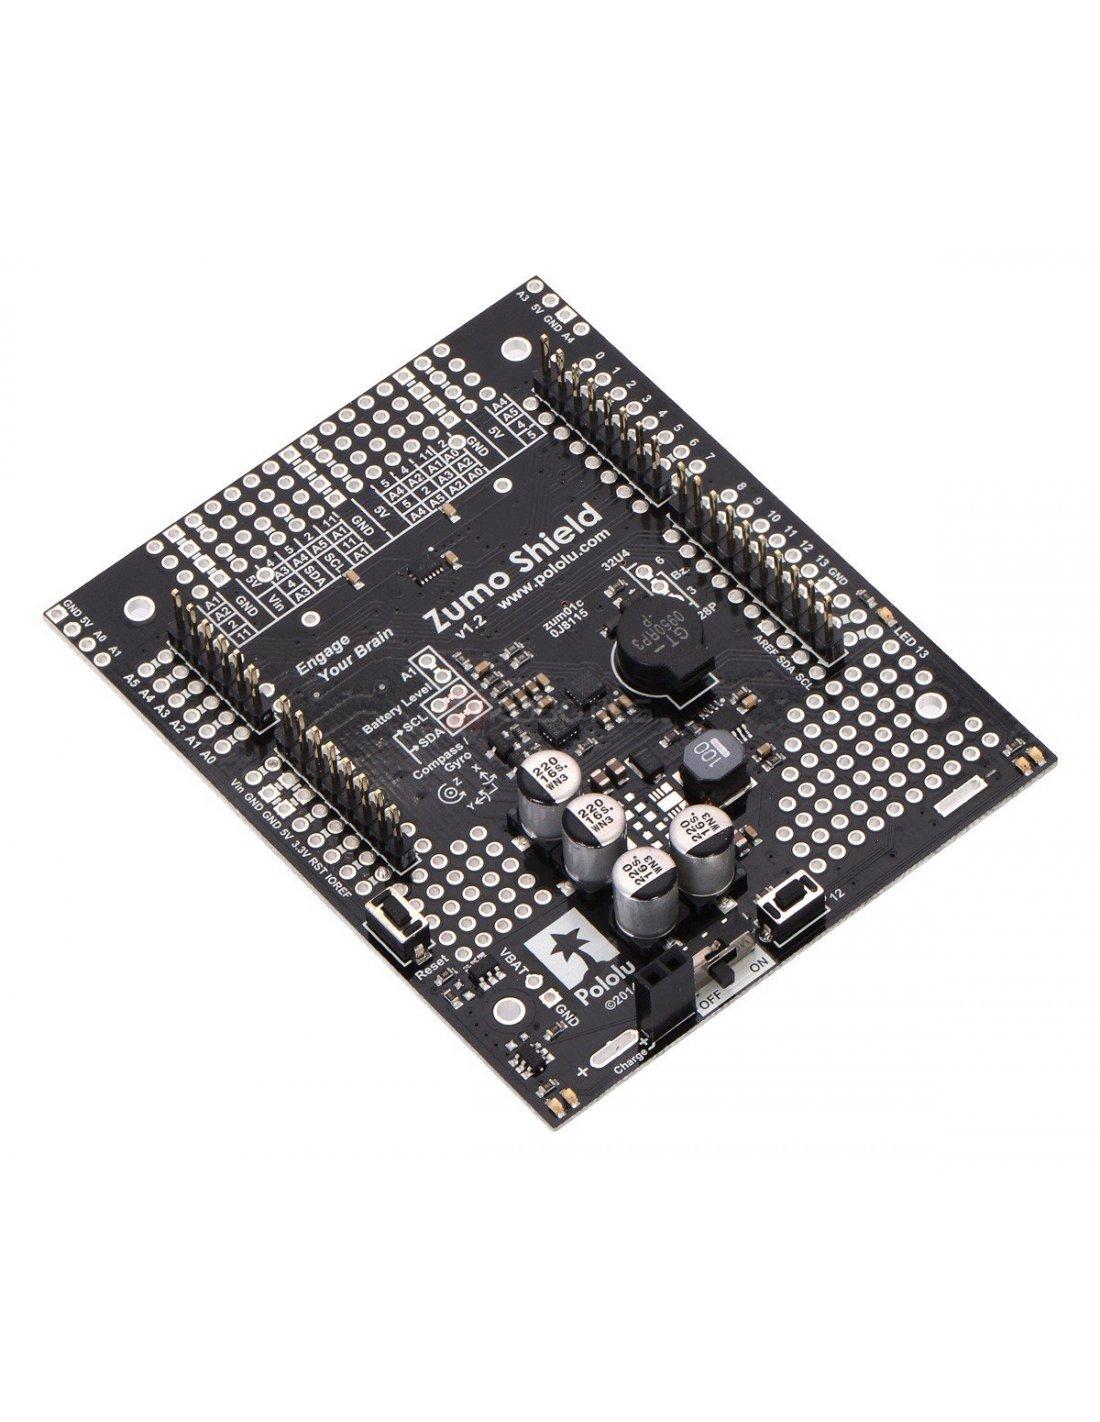 Zumo shield for arduino v